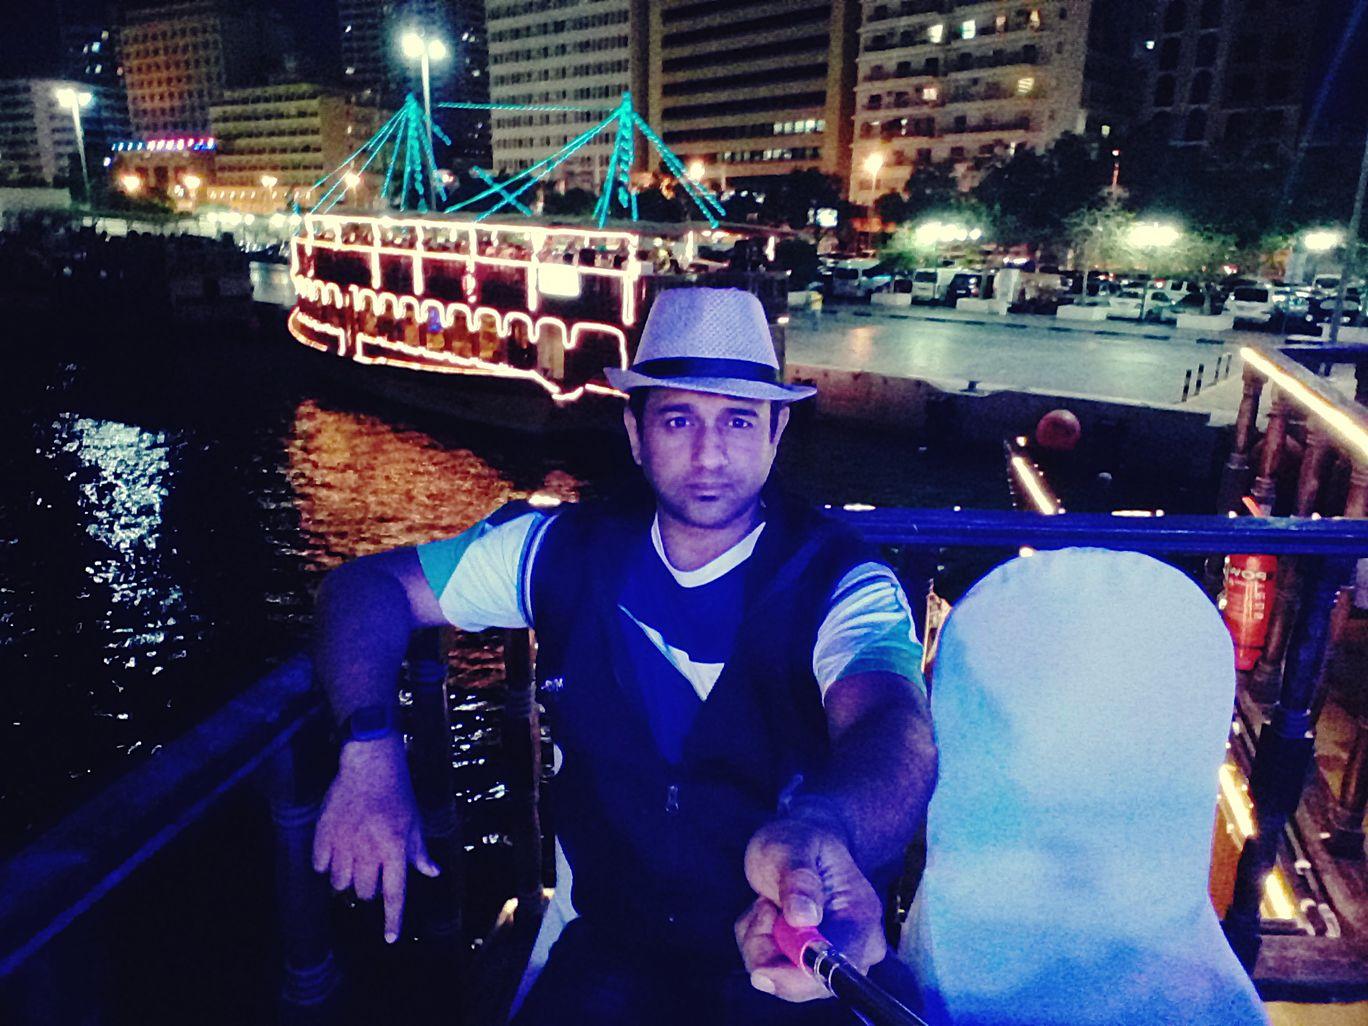 Photo of Dhow Cruise Dubai Marina - Marina Promenade - Dubai - United Arab Emirates By Prady Das (InstaPrady)